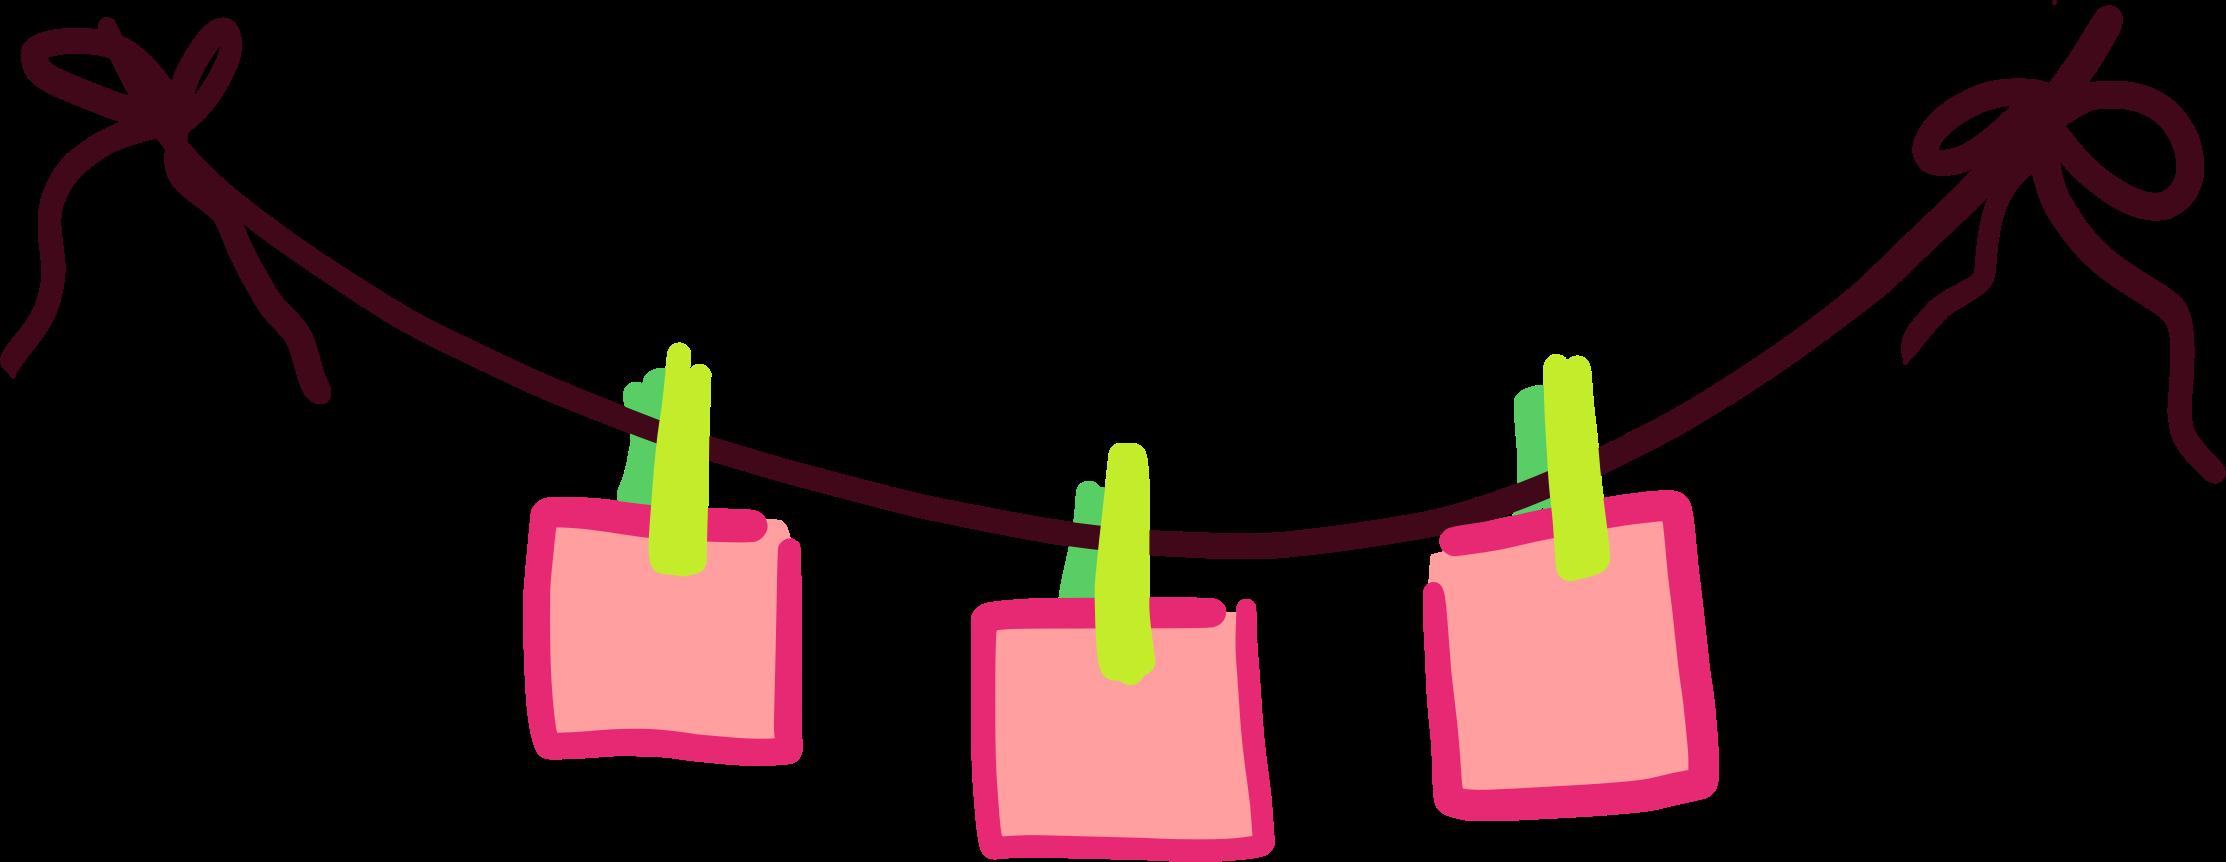 Paper clip art png. Clothespin clipart clothesline